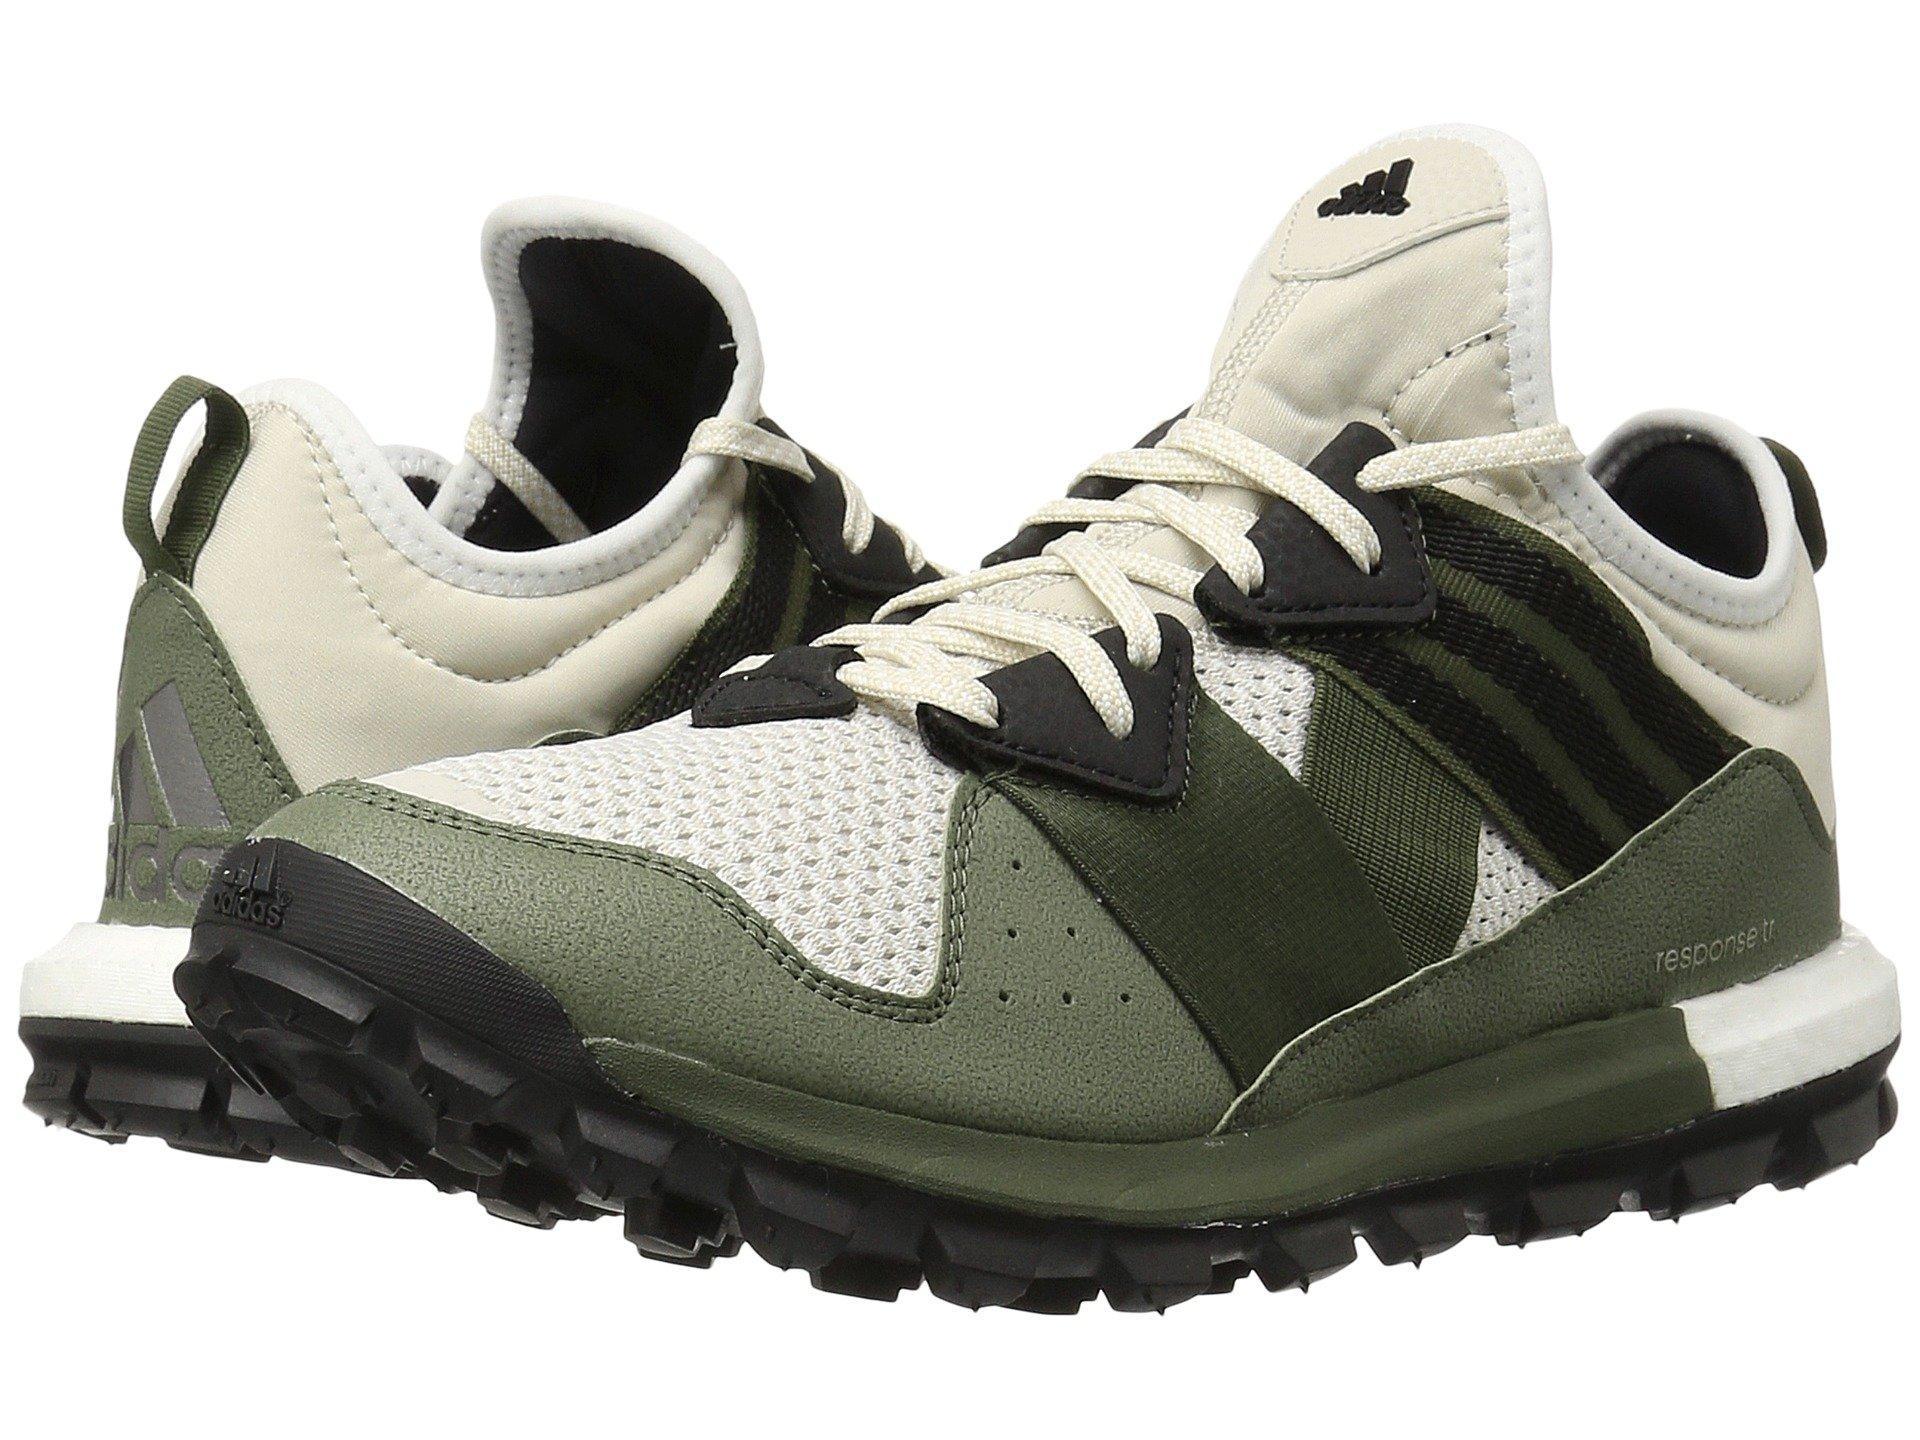 Adidas Originals Response Tr In Clear Brown/iron Metallic/base Green